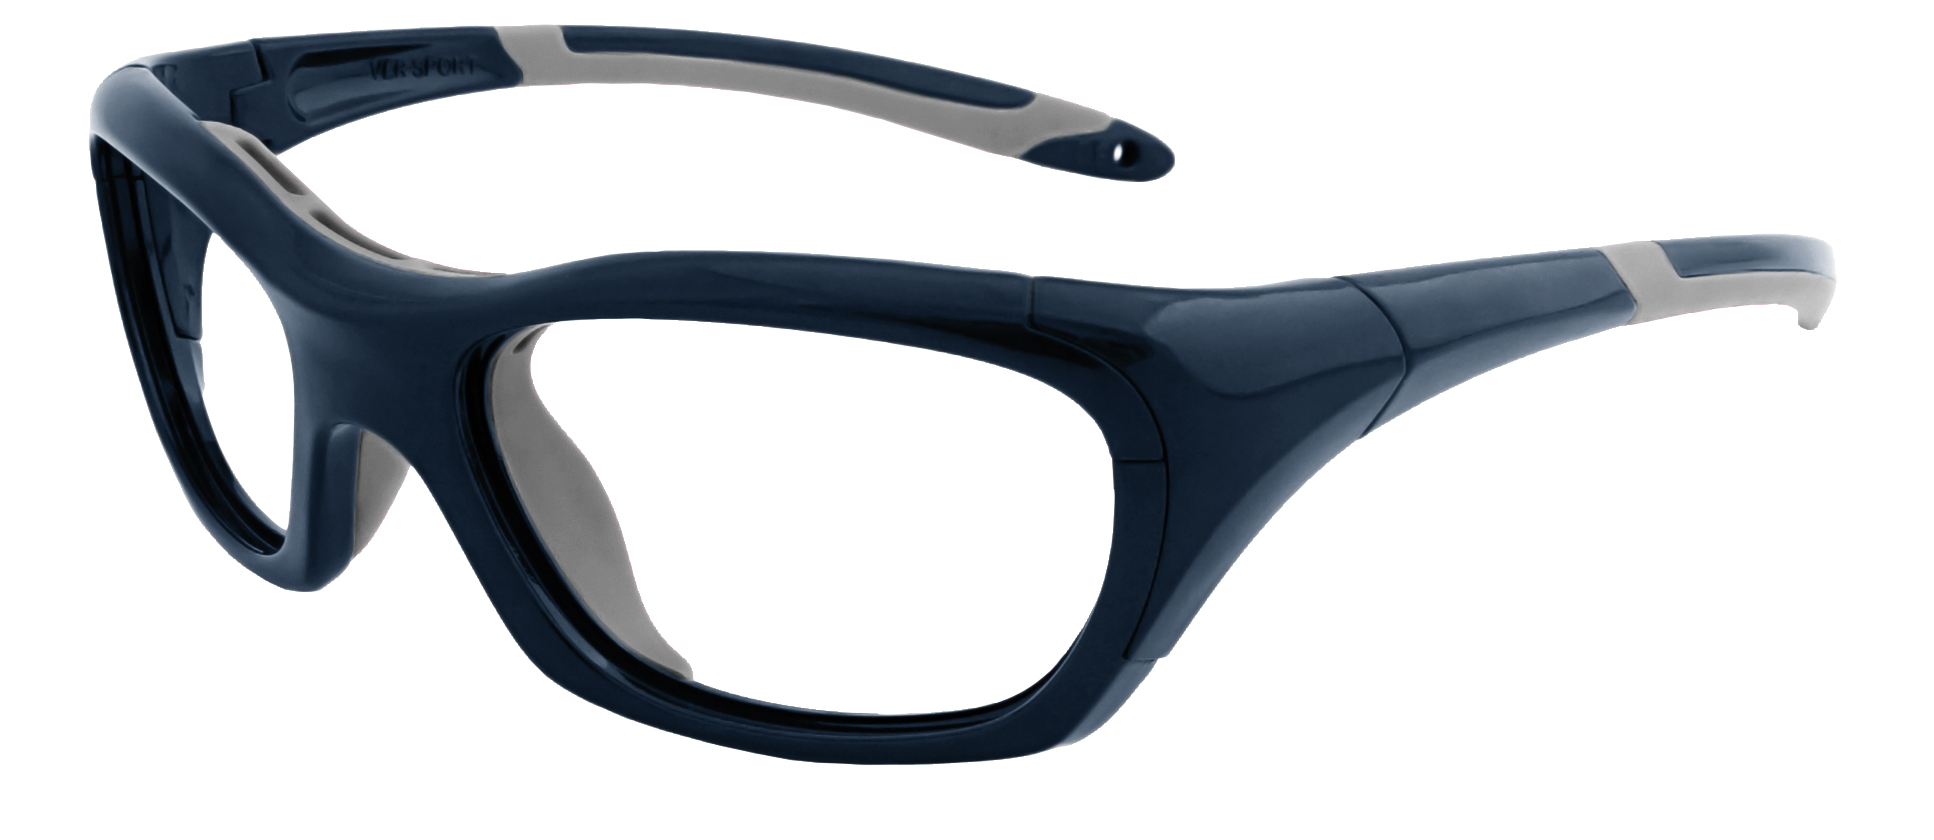 504bc167e76 Eyewear for Kids - Girl - Optiwow